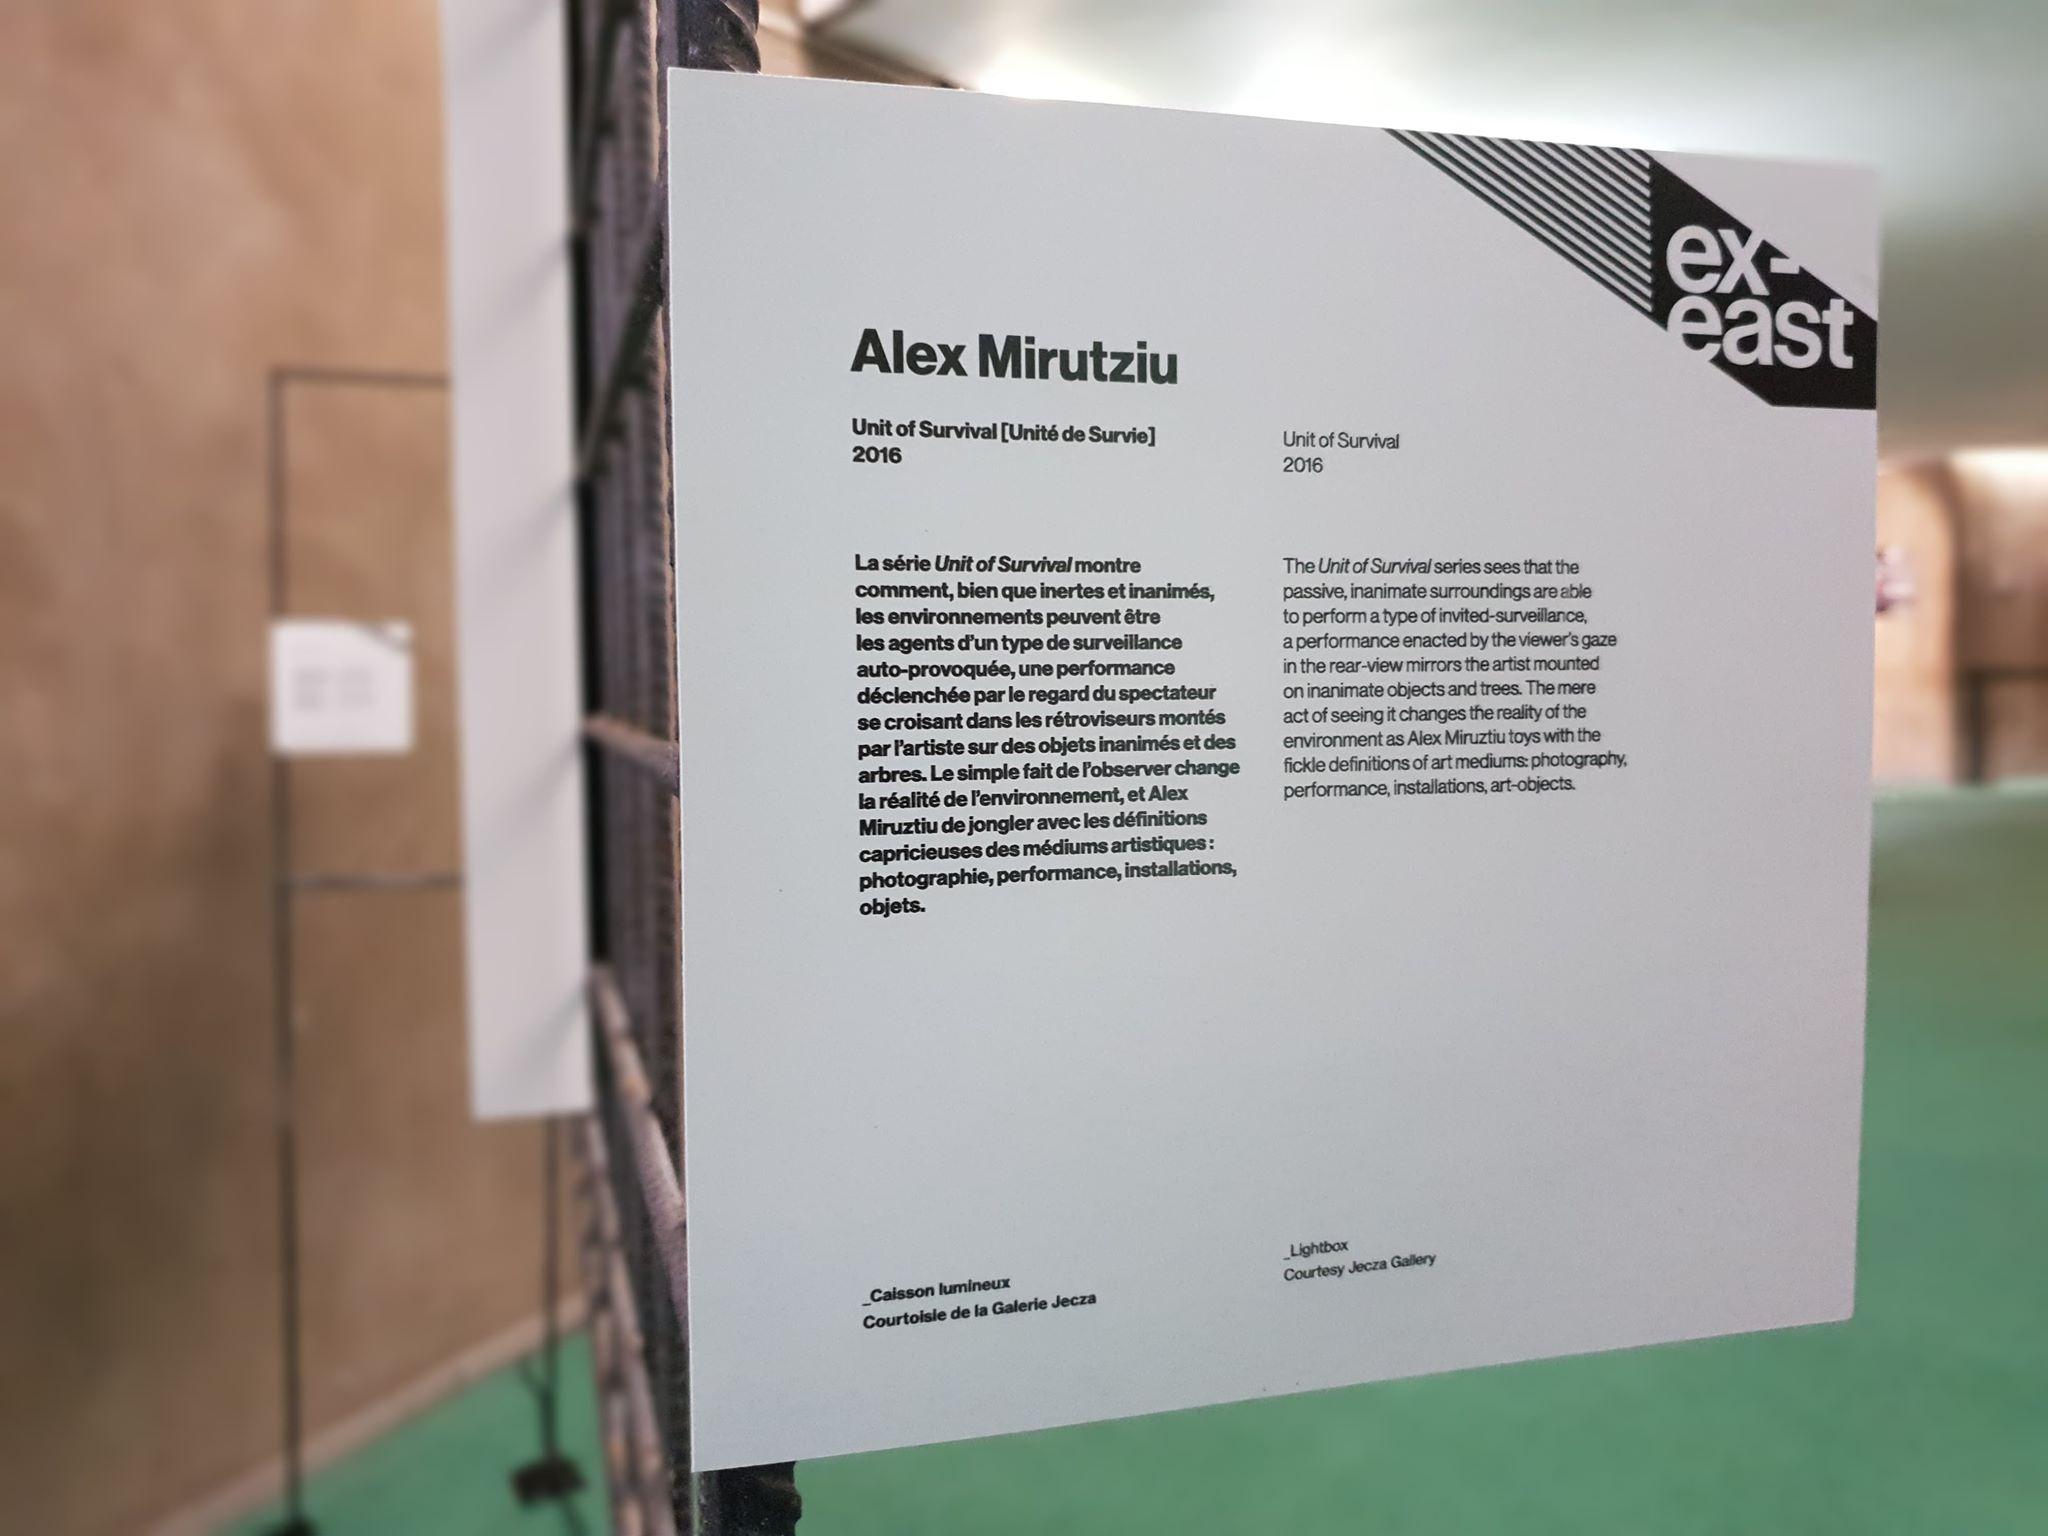 Alex-Mirutziu-Unit of survival-2.jpg